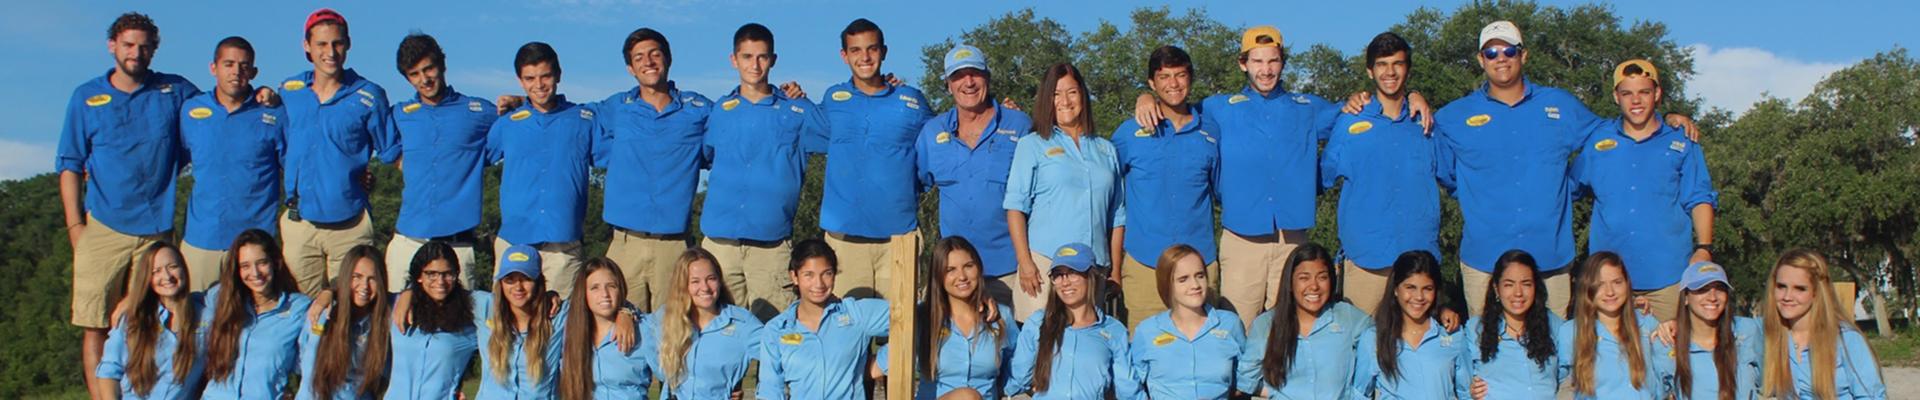 Summer Camp Florida Camp Guaikinima Team